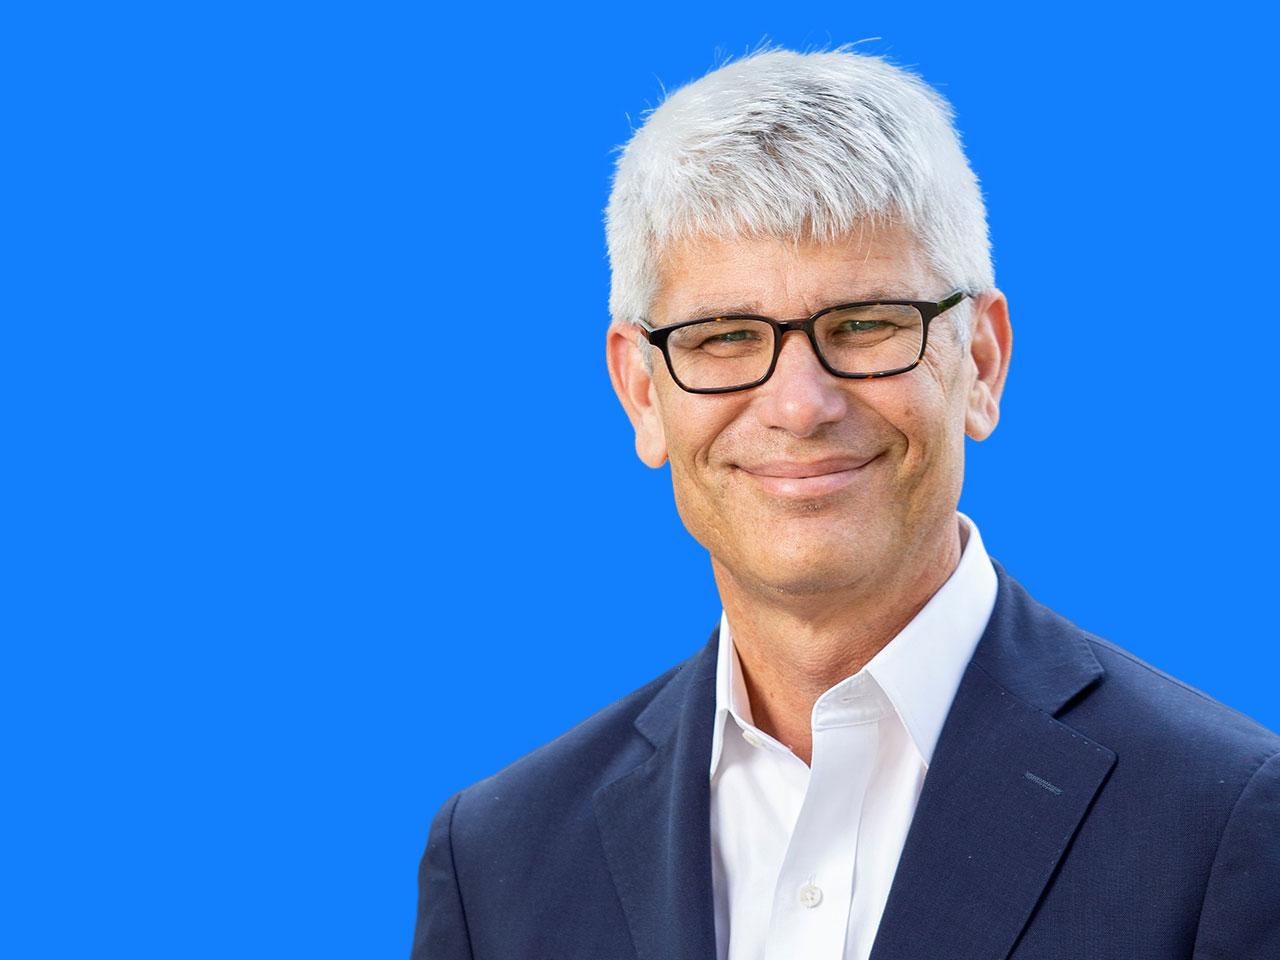 Chris Forman Appcast CEO